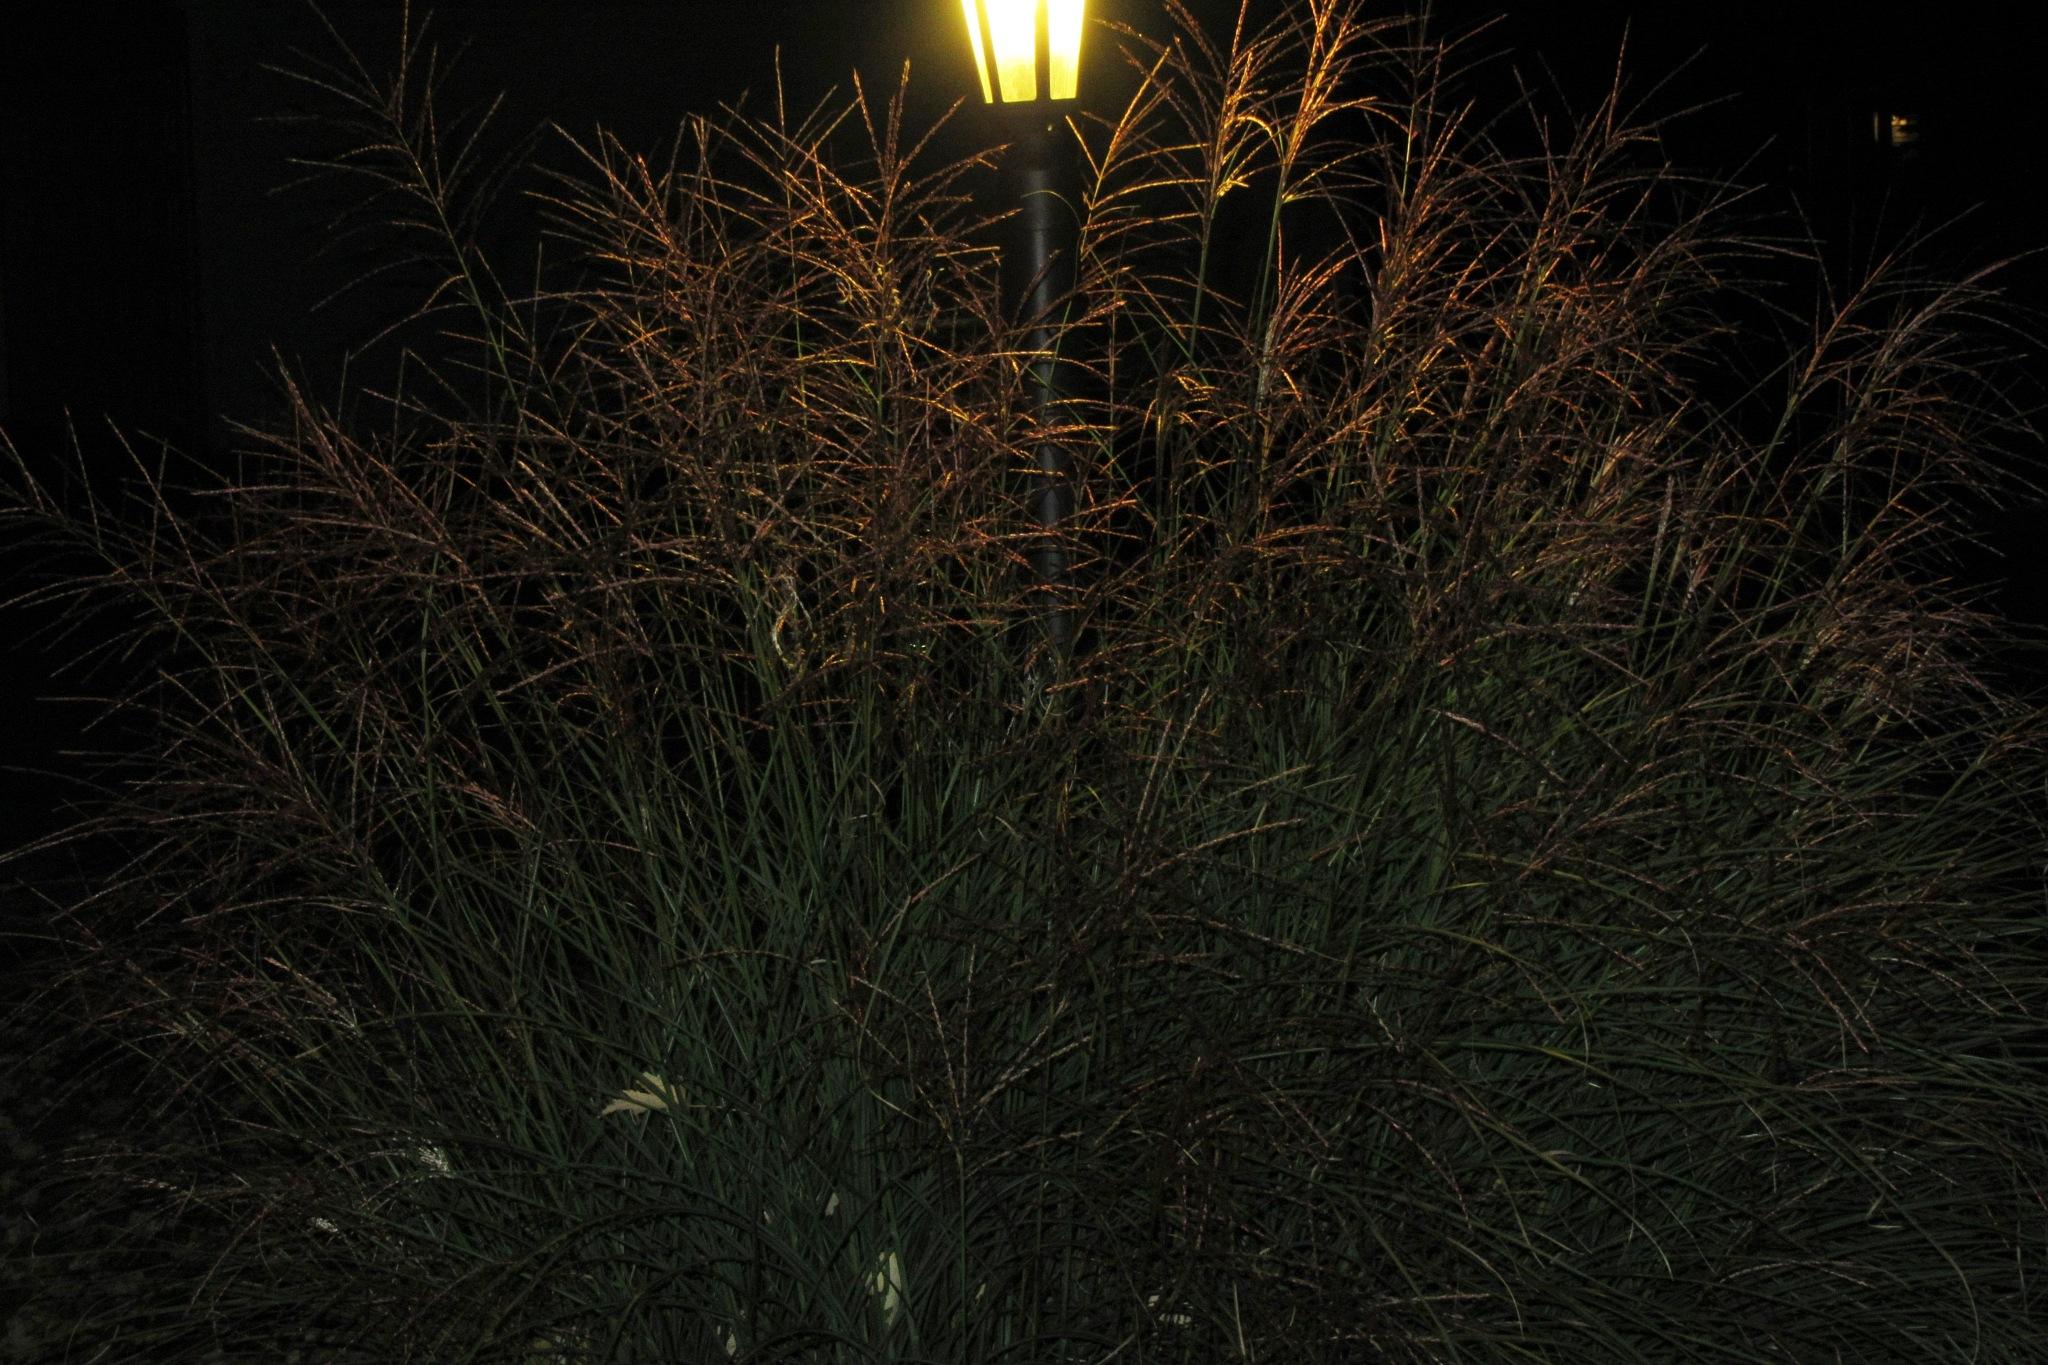 Grass around Light Pole by Darlene Pavek